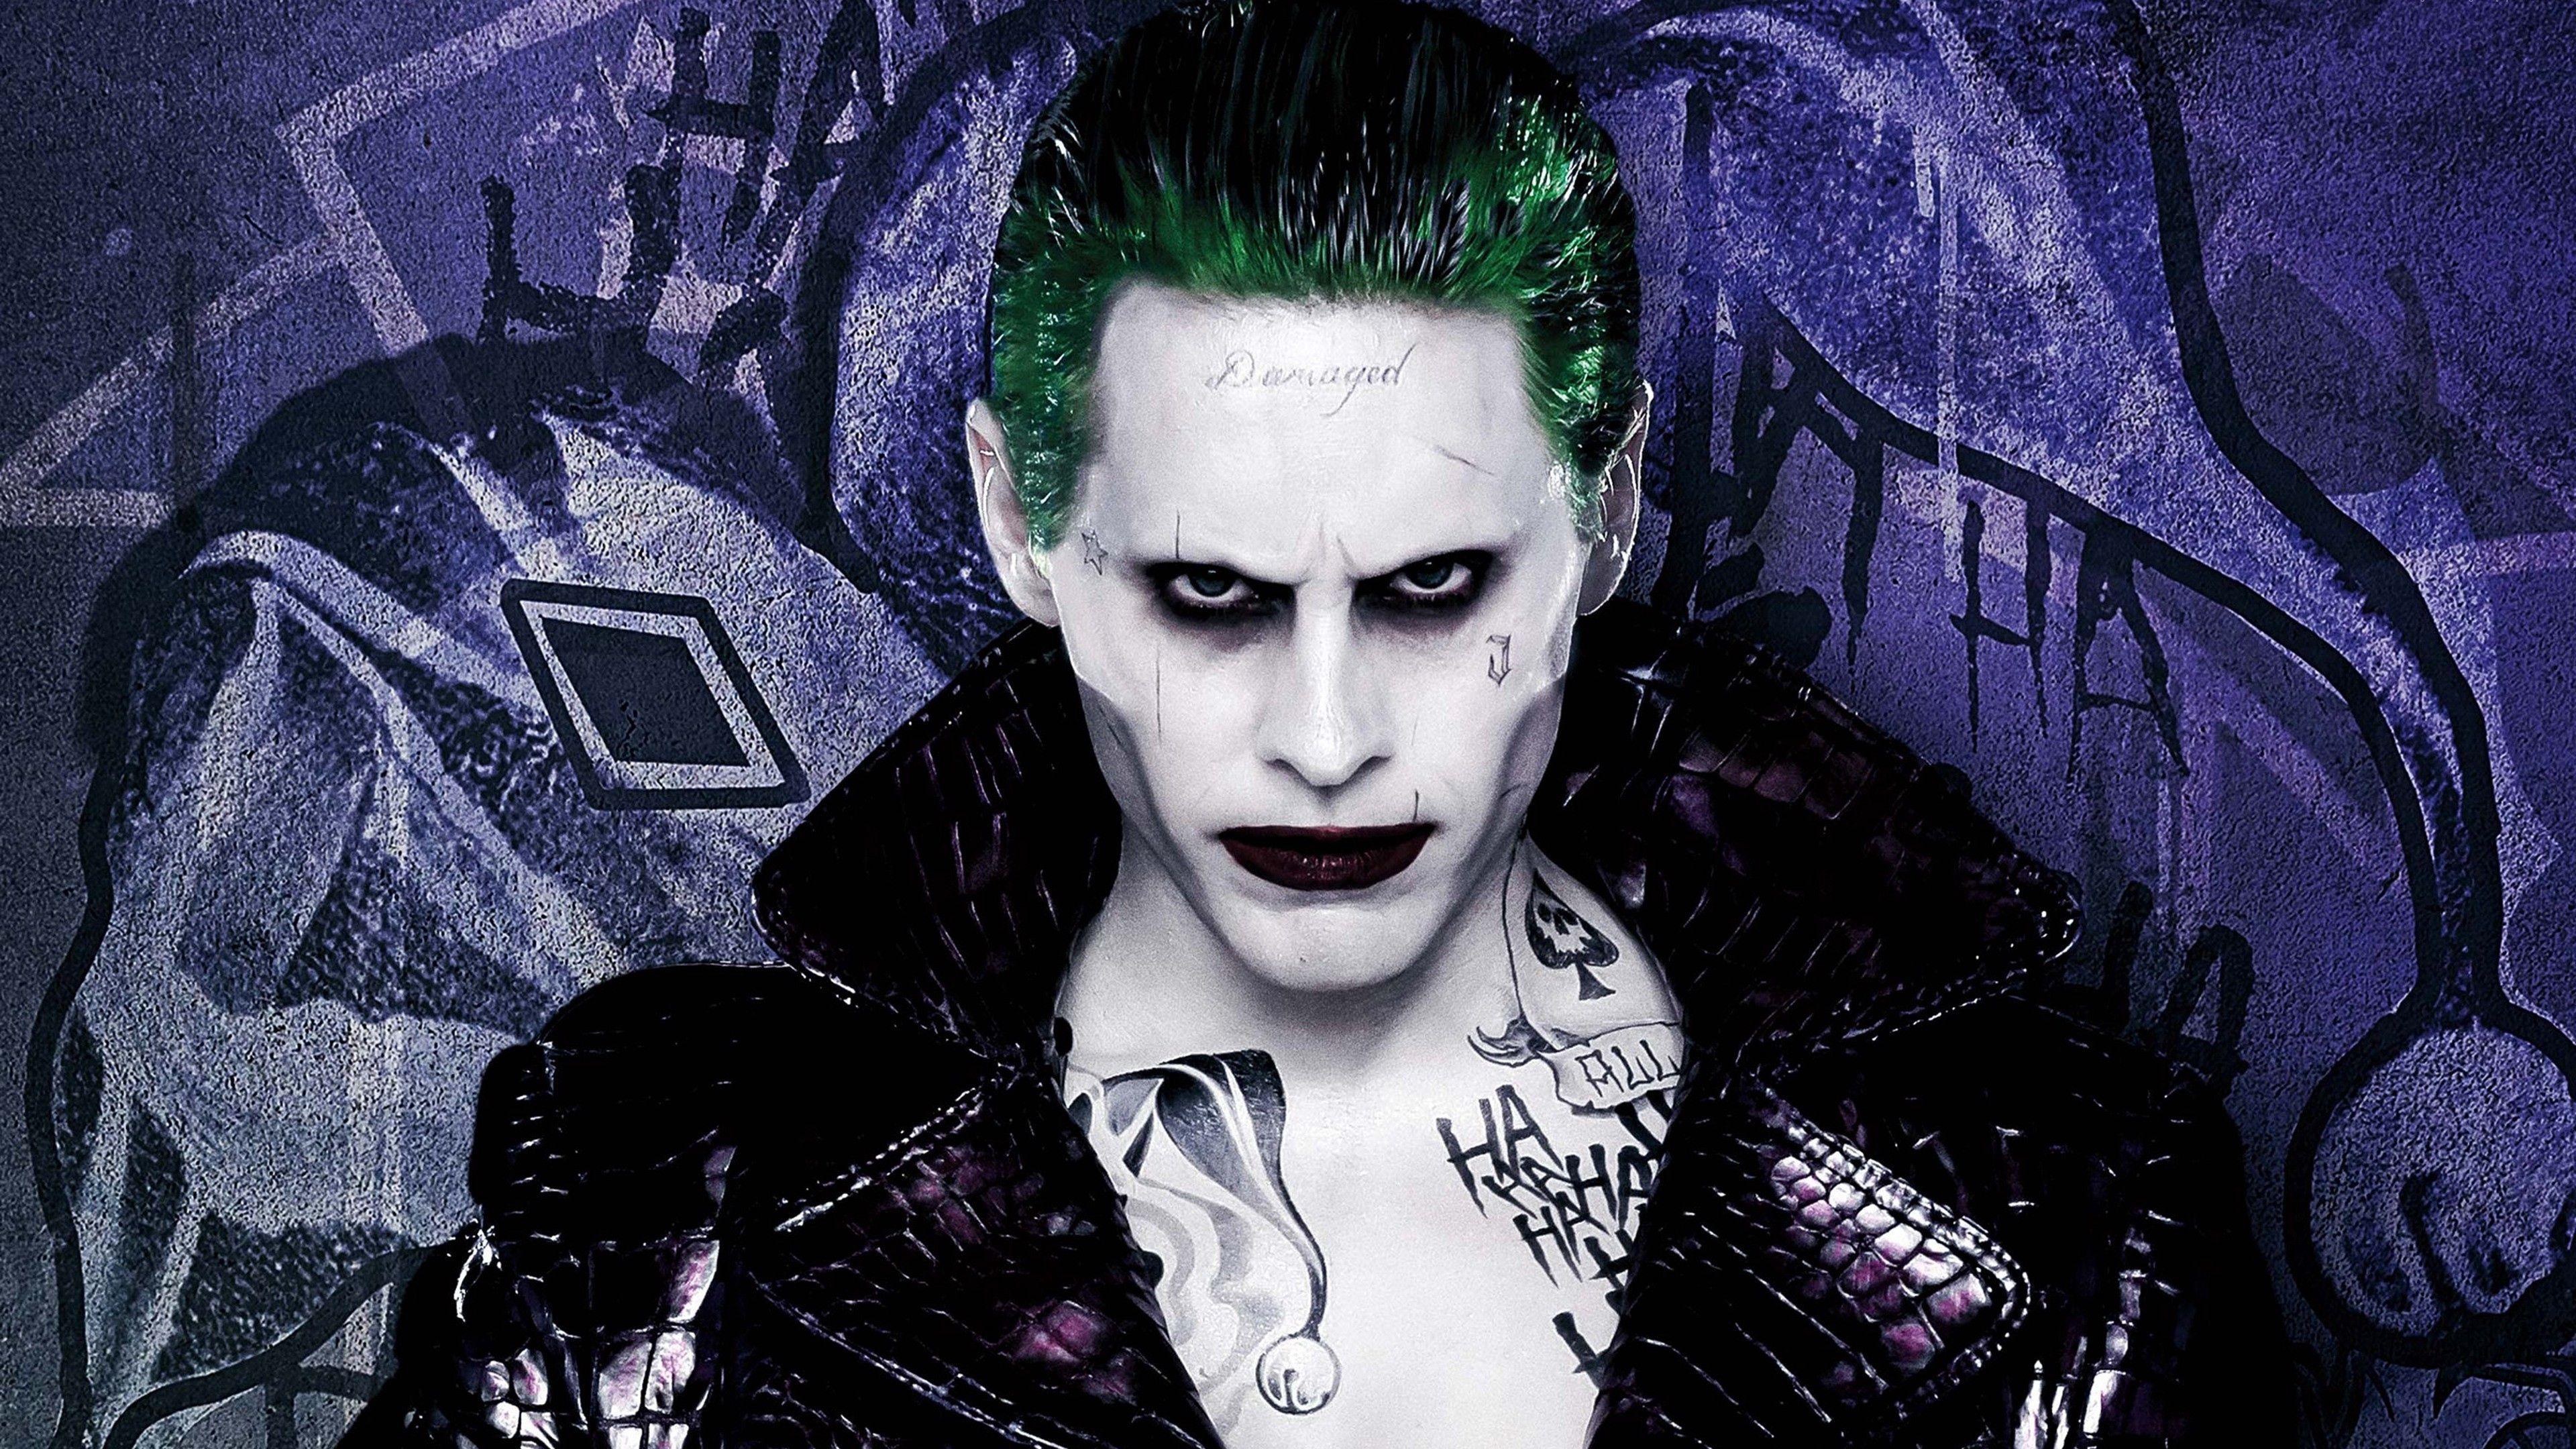 Joker Suicide Squad 4K Wallpapers   Top Joker Suicide Squad 3840x2160